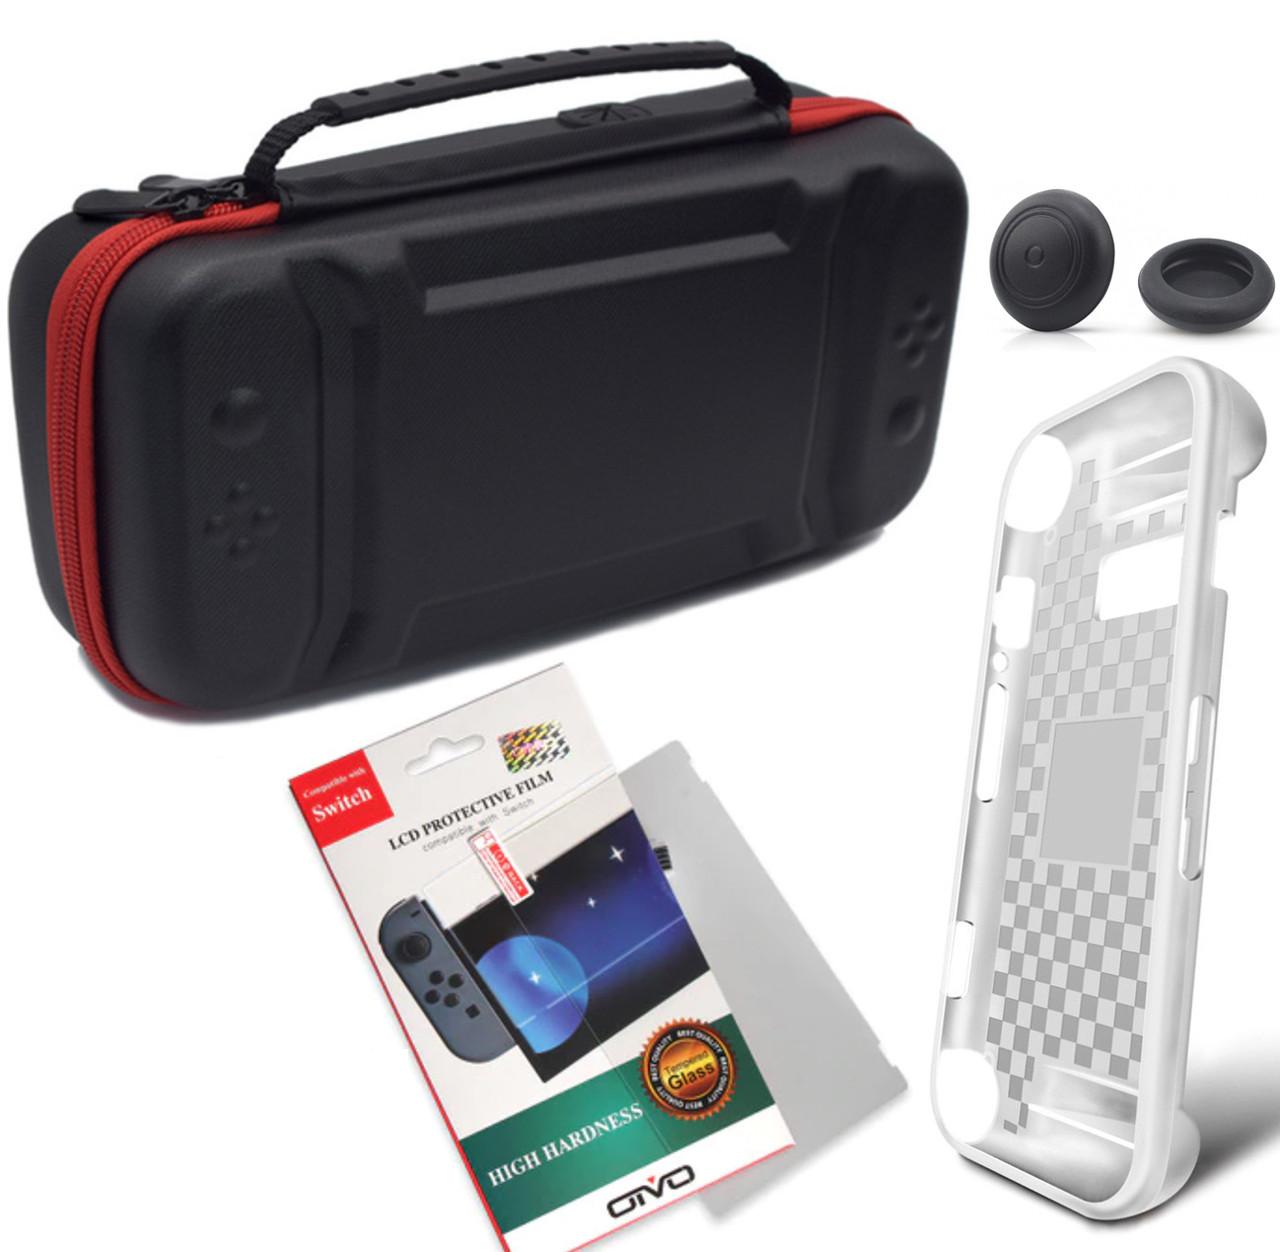 Комплект кейс EastVita + скло OIVO + чохол MIMD + накладки для Nintendo Switch